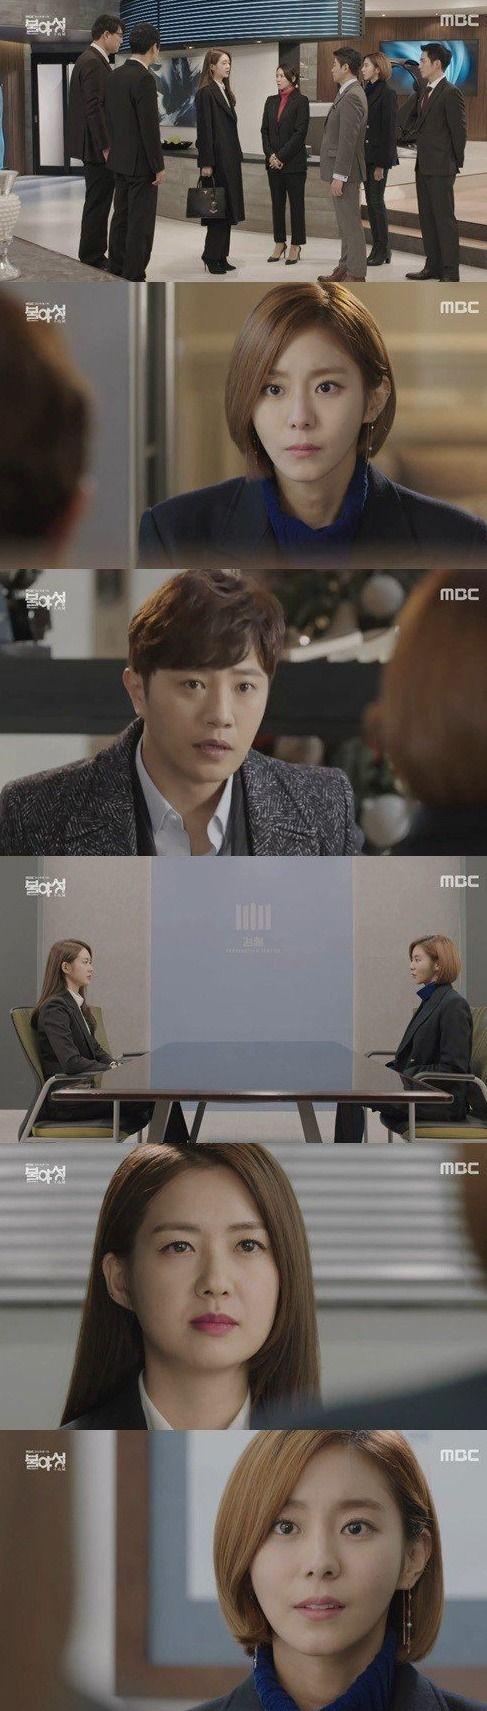 Night light korean drama synopsis -  Spoiler Added Episode 8 Captures For The Kdrama Night Light